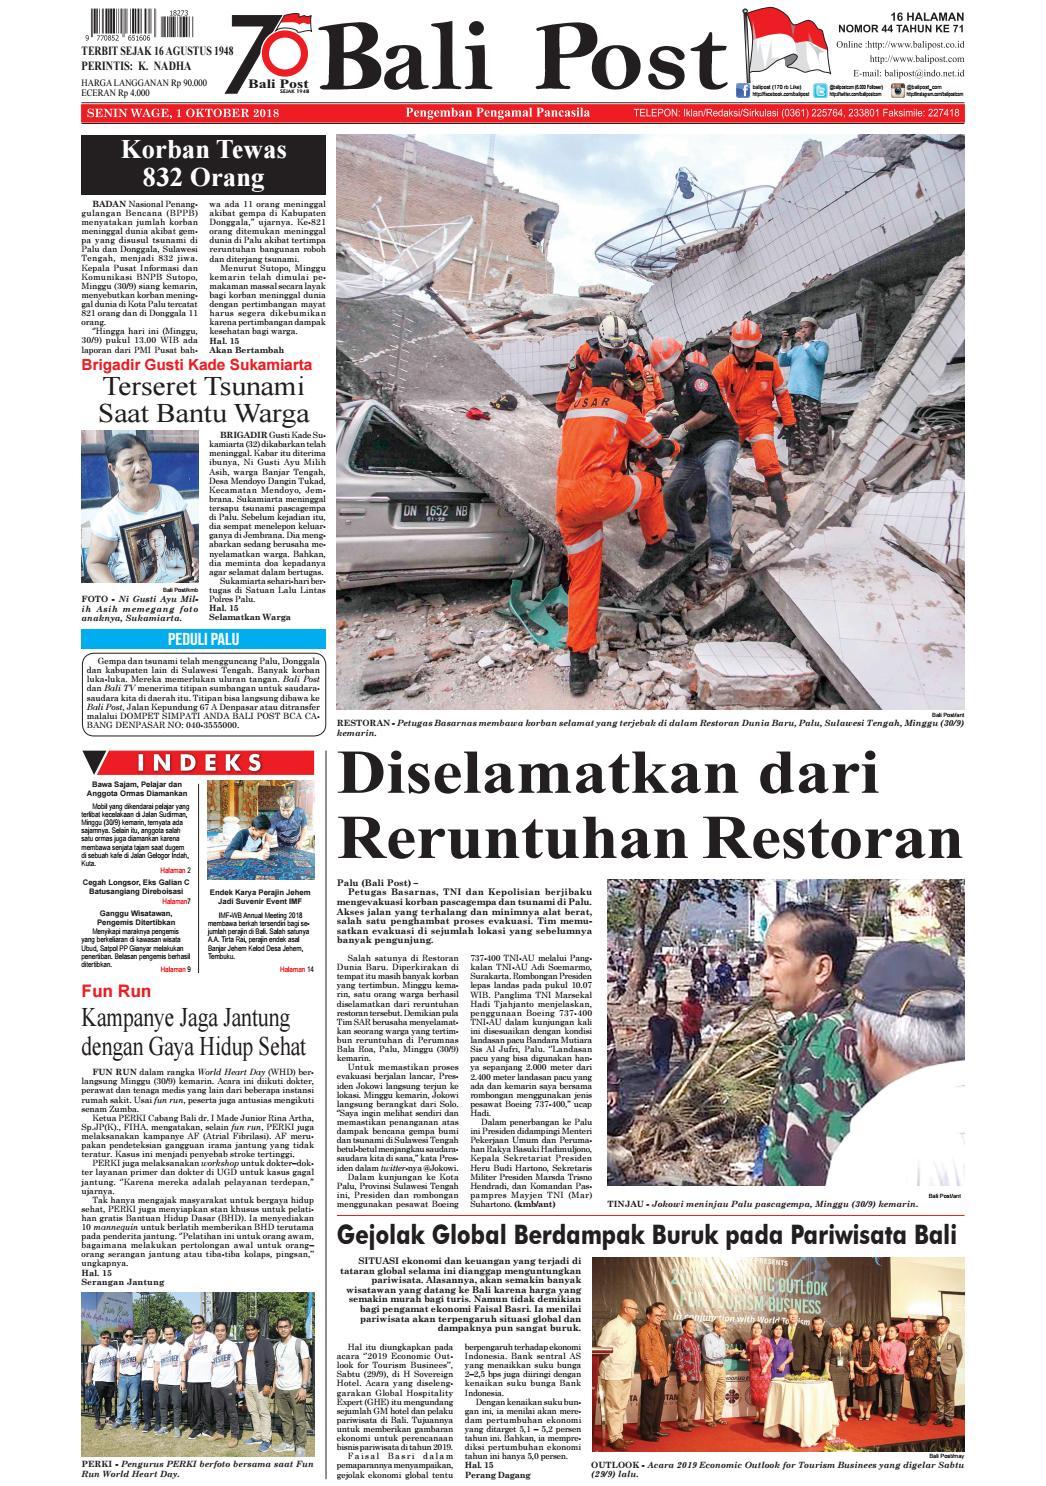 Edisi Senin 1 Oktober 2018 Balipostcom By E Paper Kmb Issuu Cb150 Verza Spoke Wheel Masculine Black Kendal